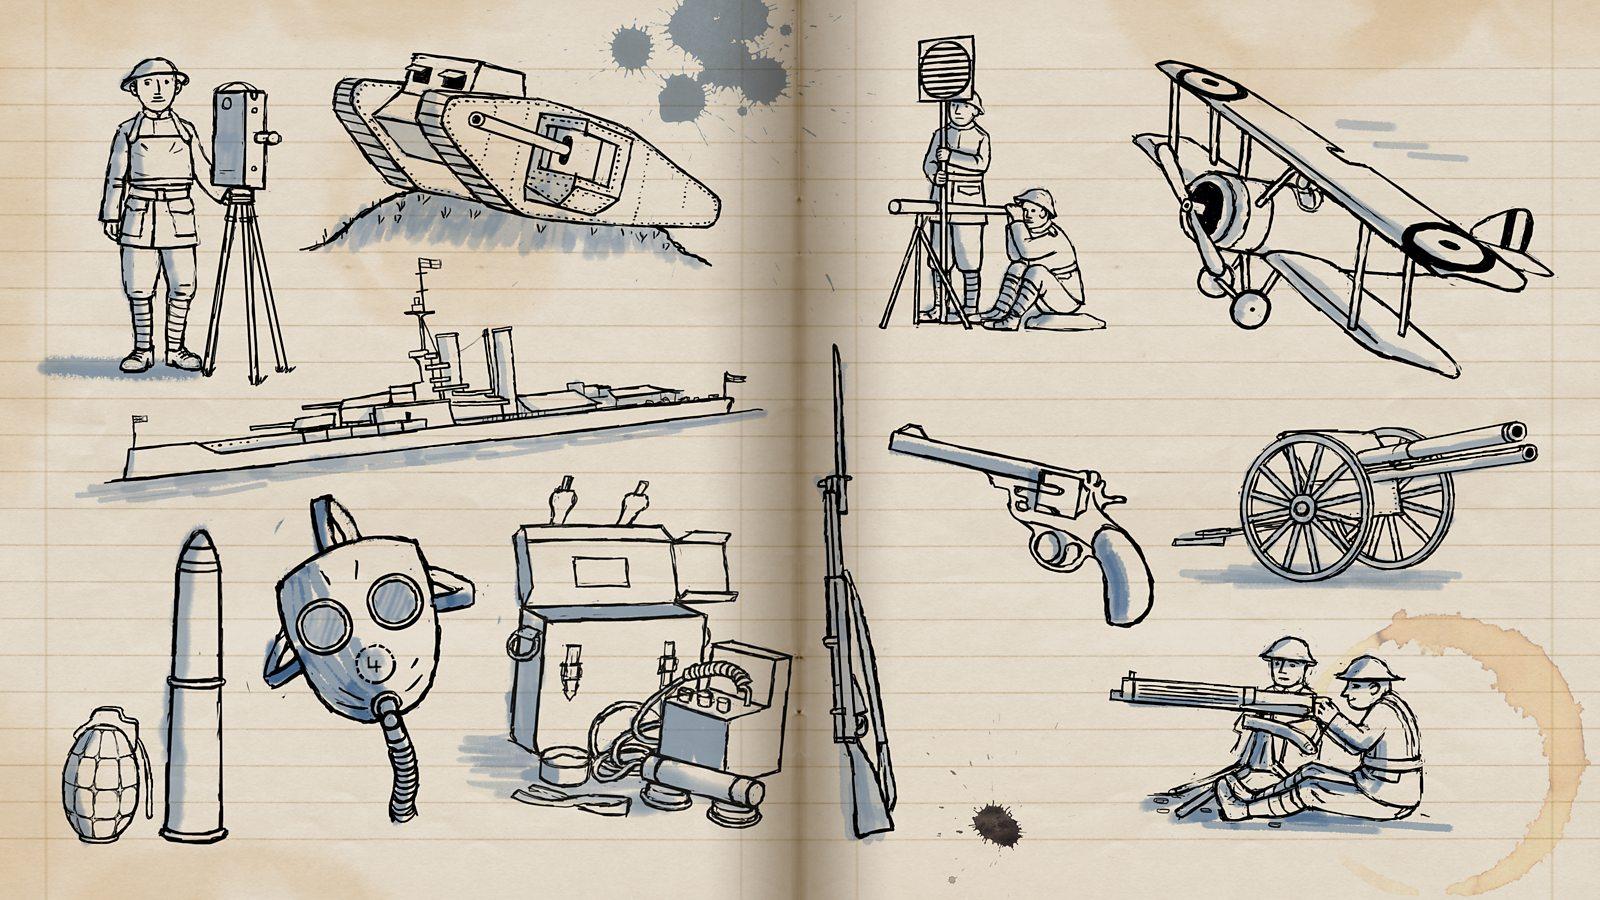 Drawn pistol ww1 gun Weapons WW1? were and used